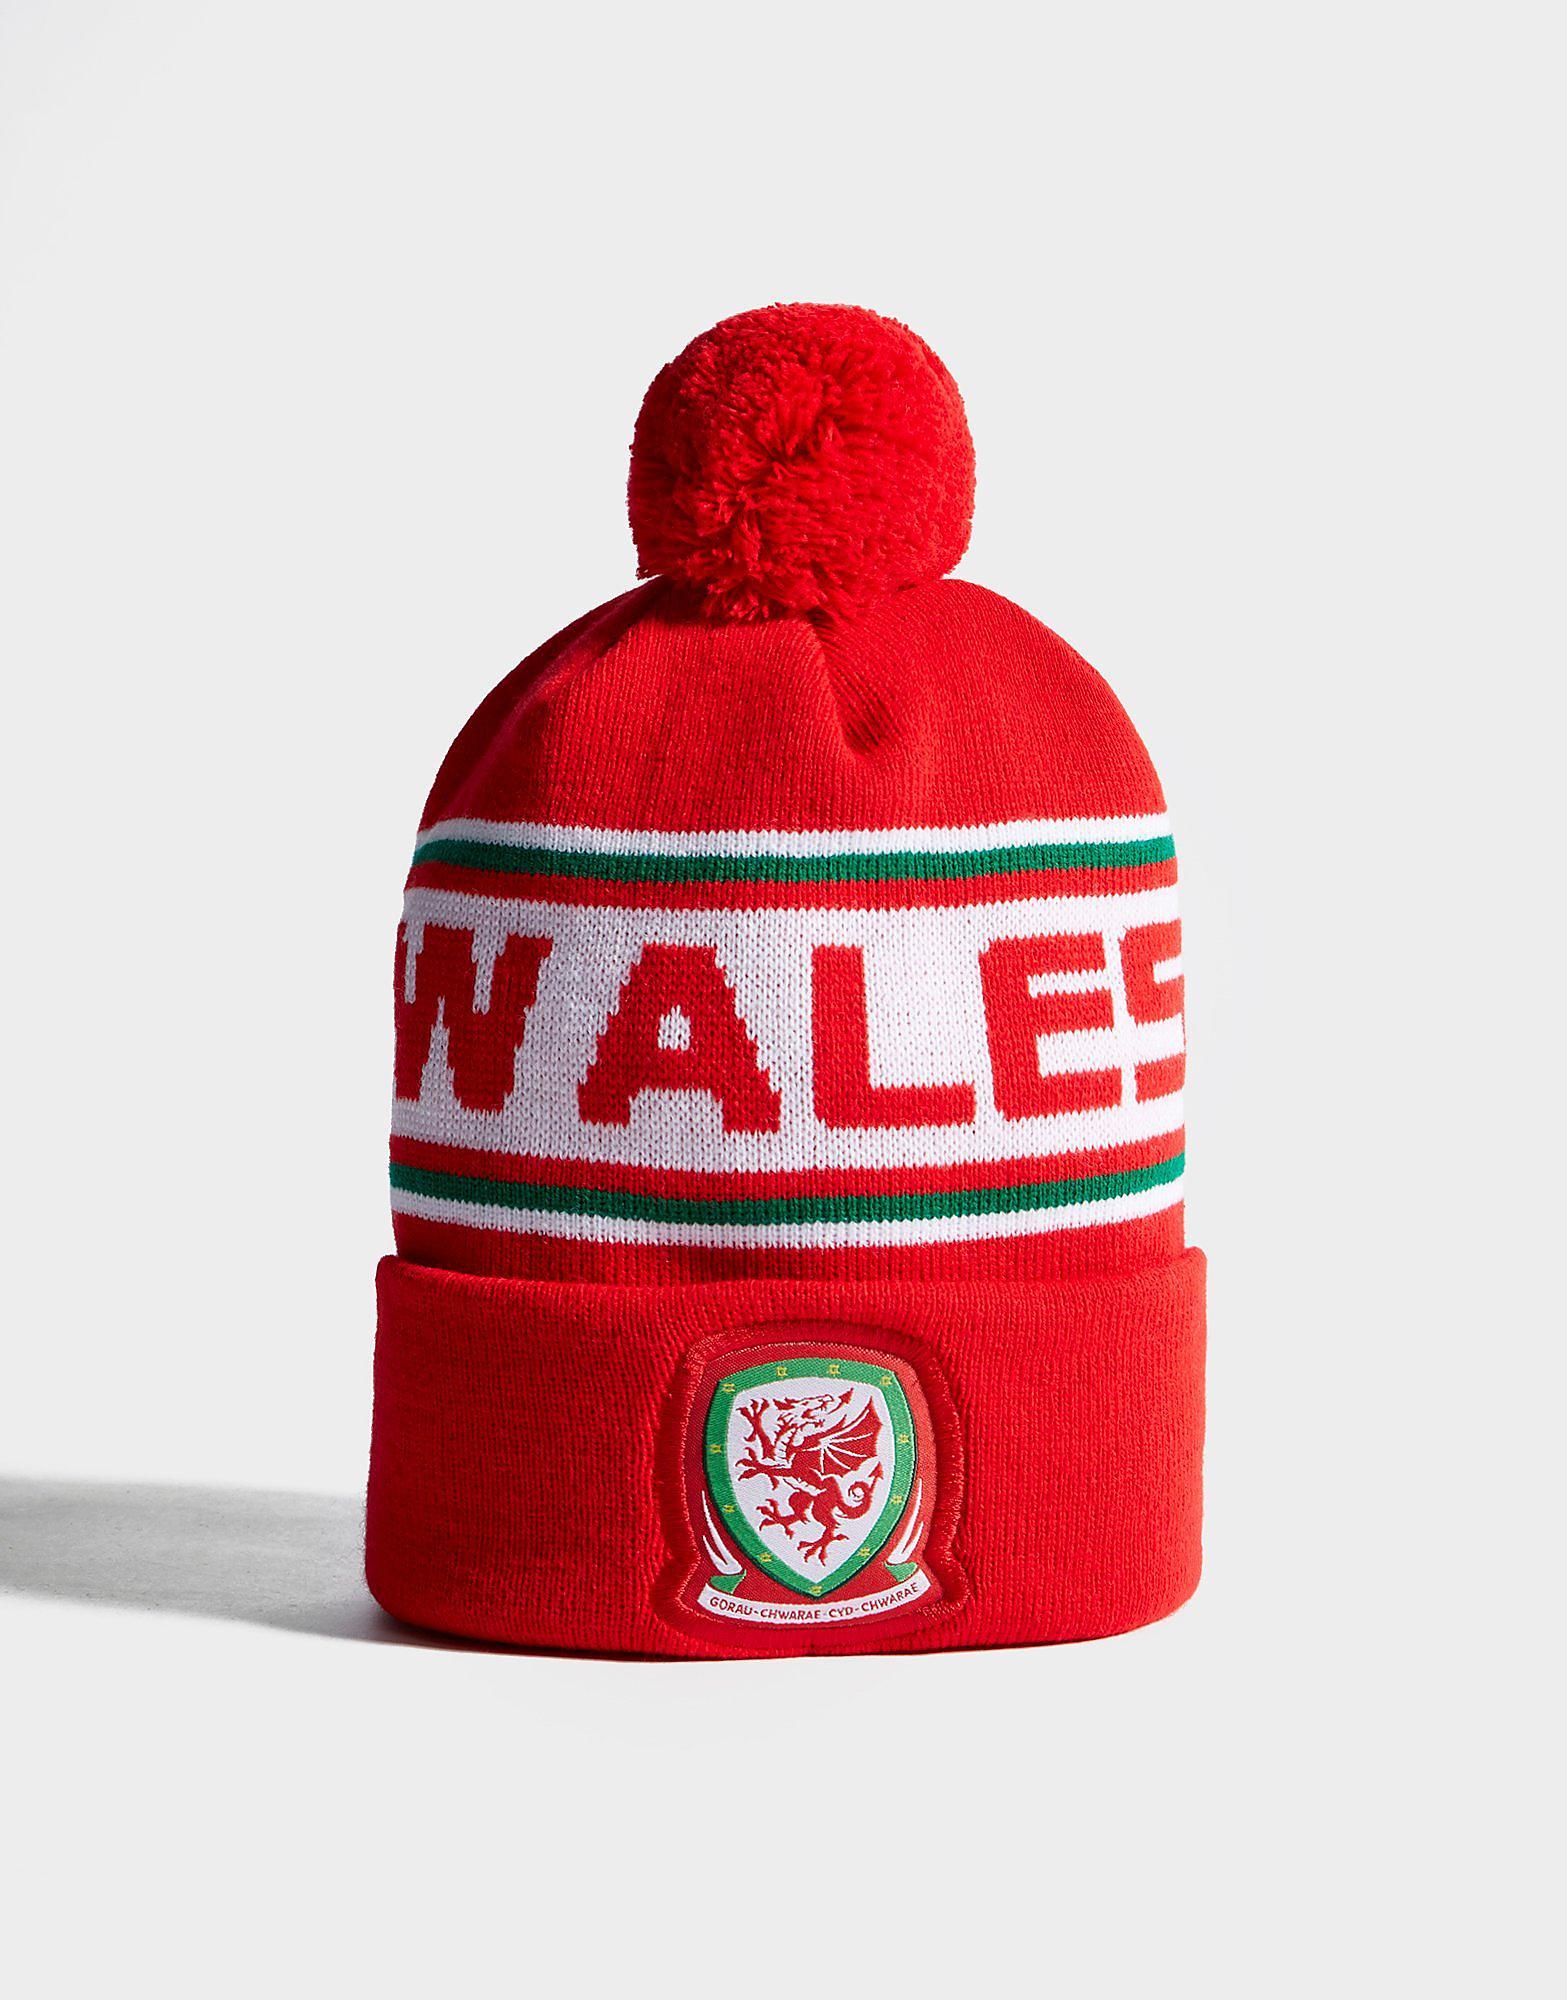 Official Team Gebreide pomponmuts met Wales-opschrift